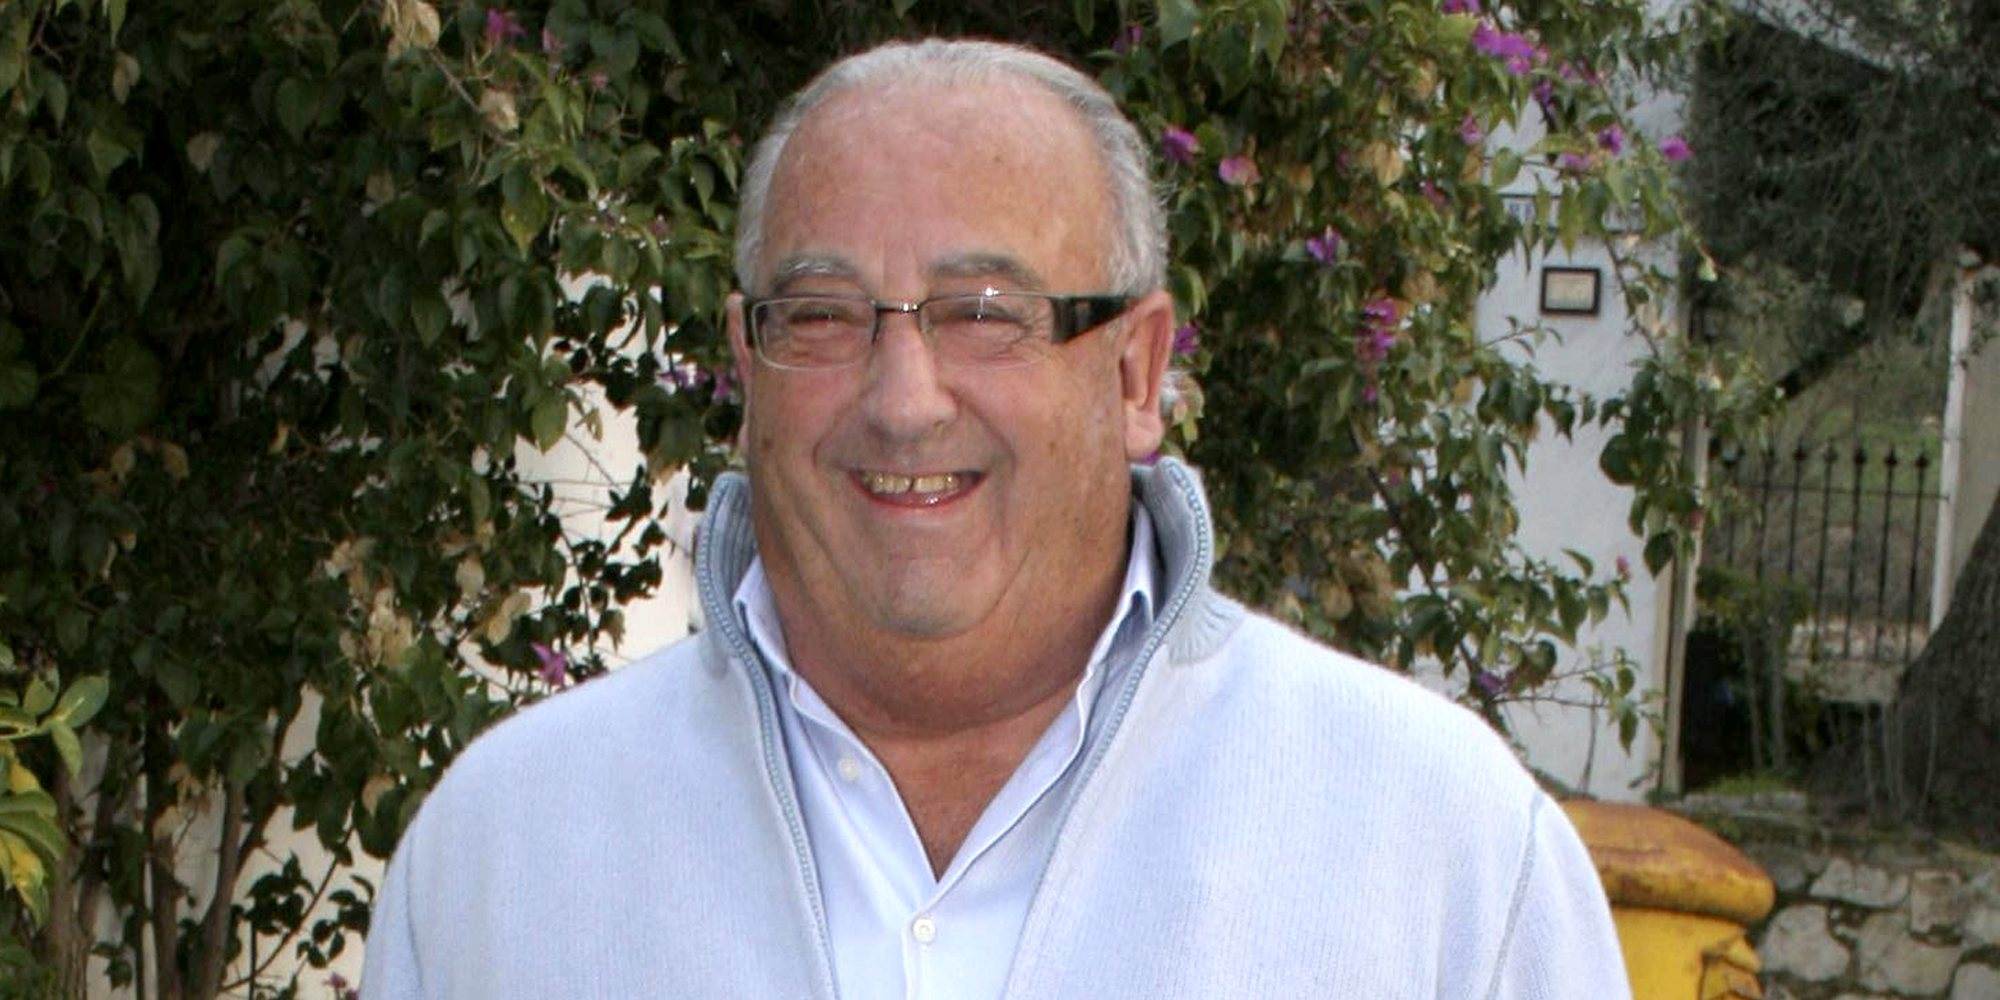 Muere Humberto Janeiro, padre de Jesulín de Ubrique, tras sufrir un shock séptico